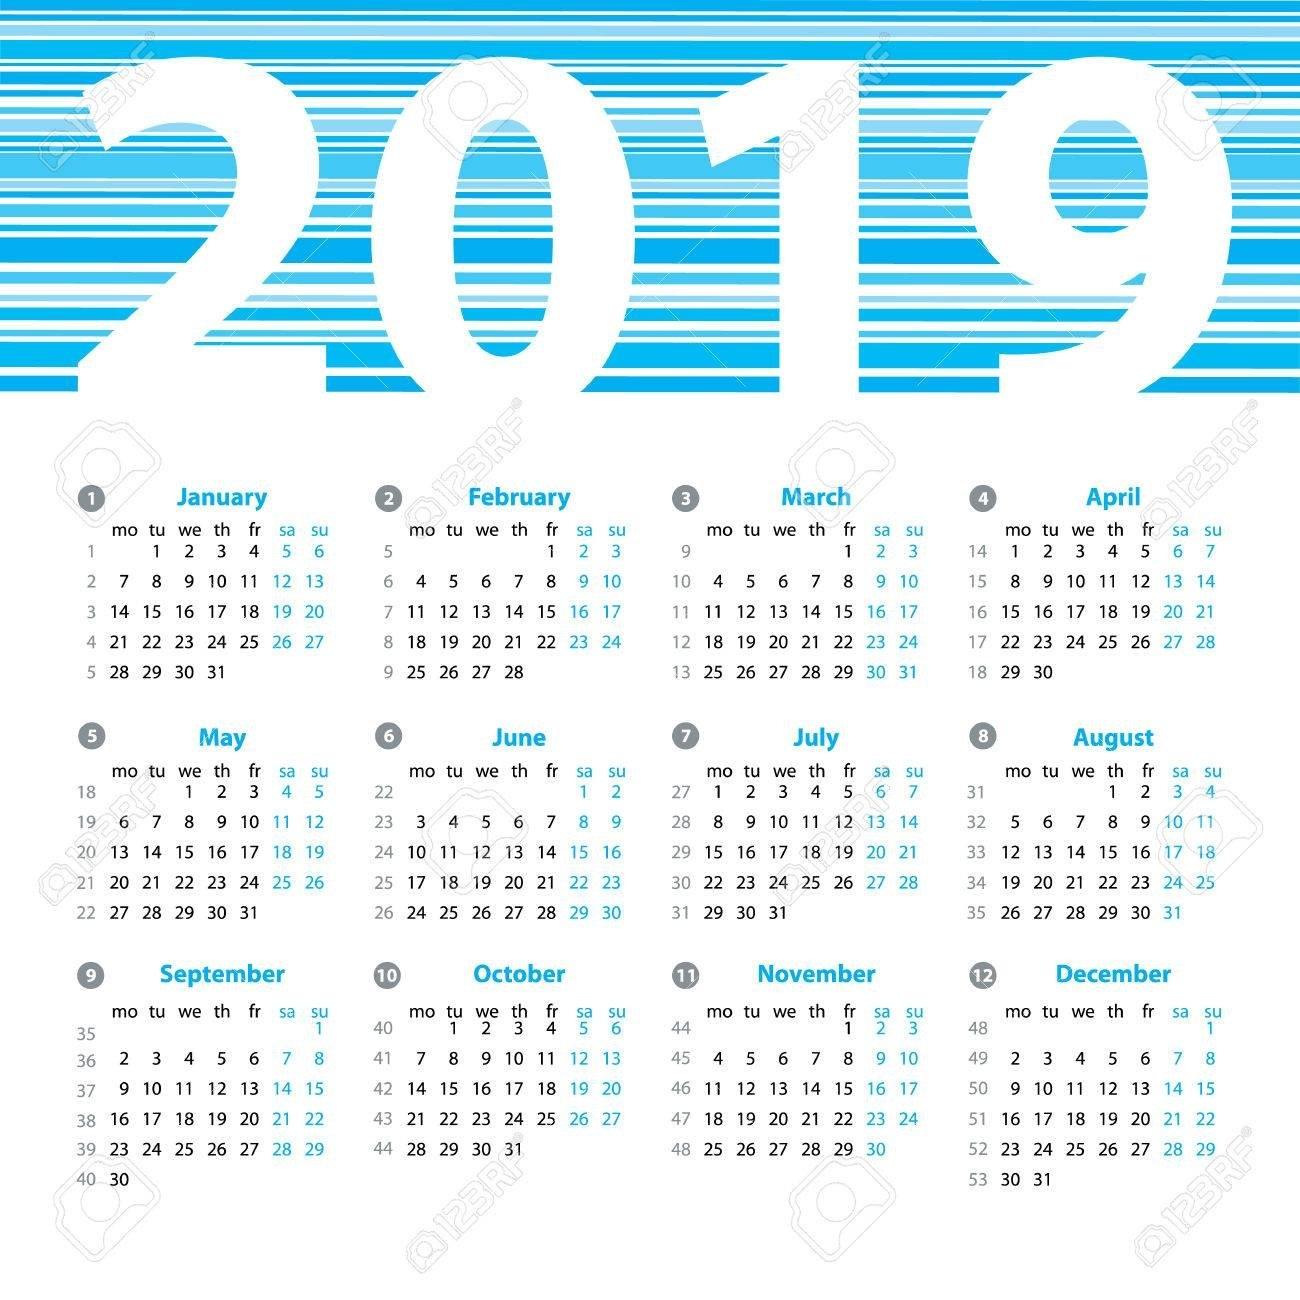 Calendar 2019 Year Vector Design Template With Week Numbers And Calendar Week 39 2019